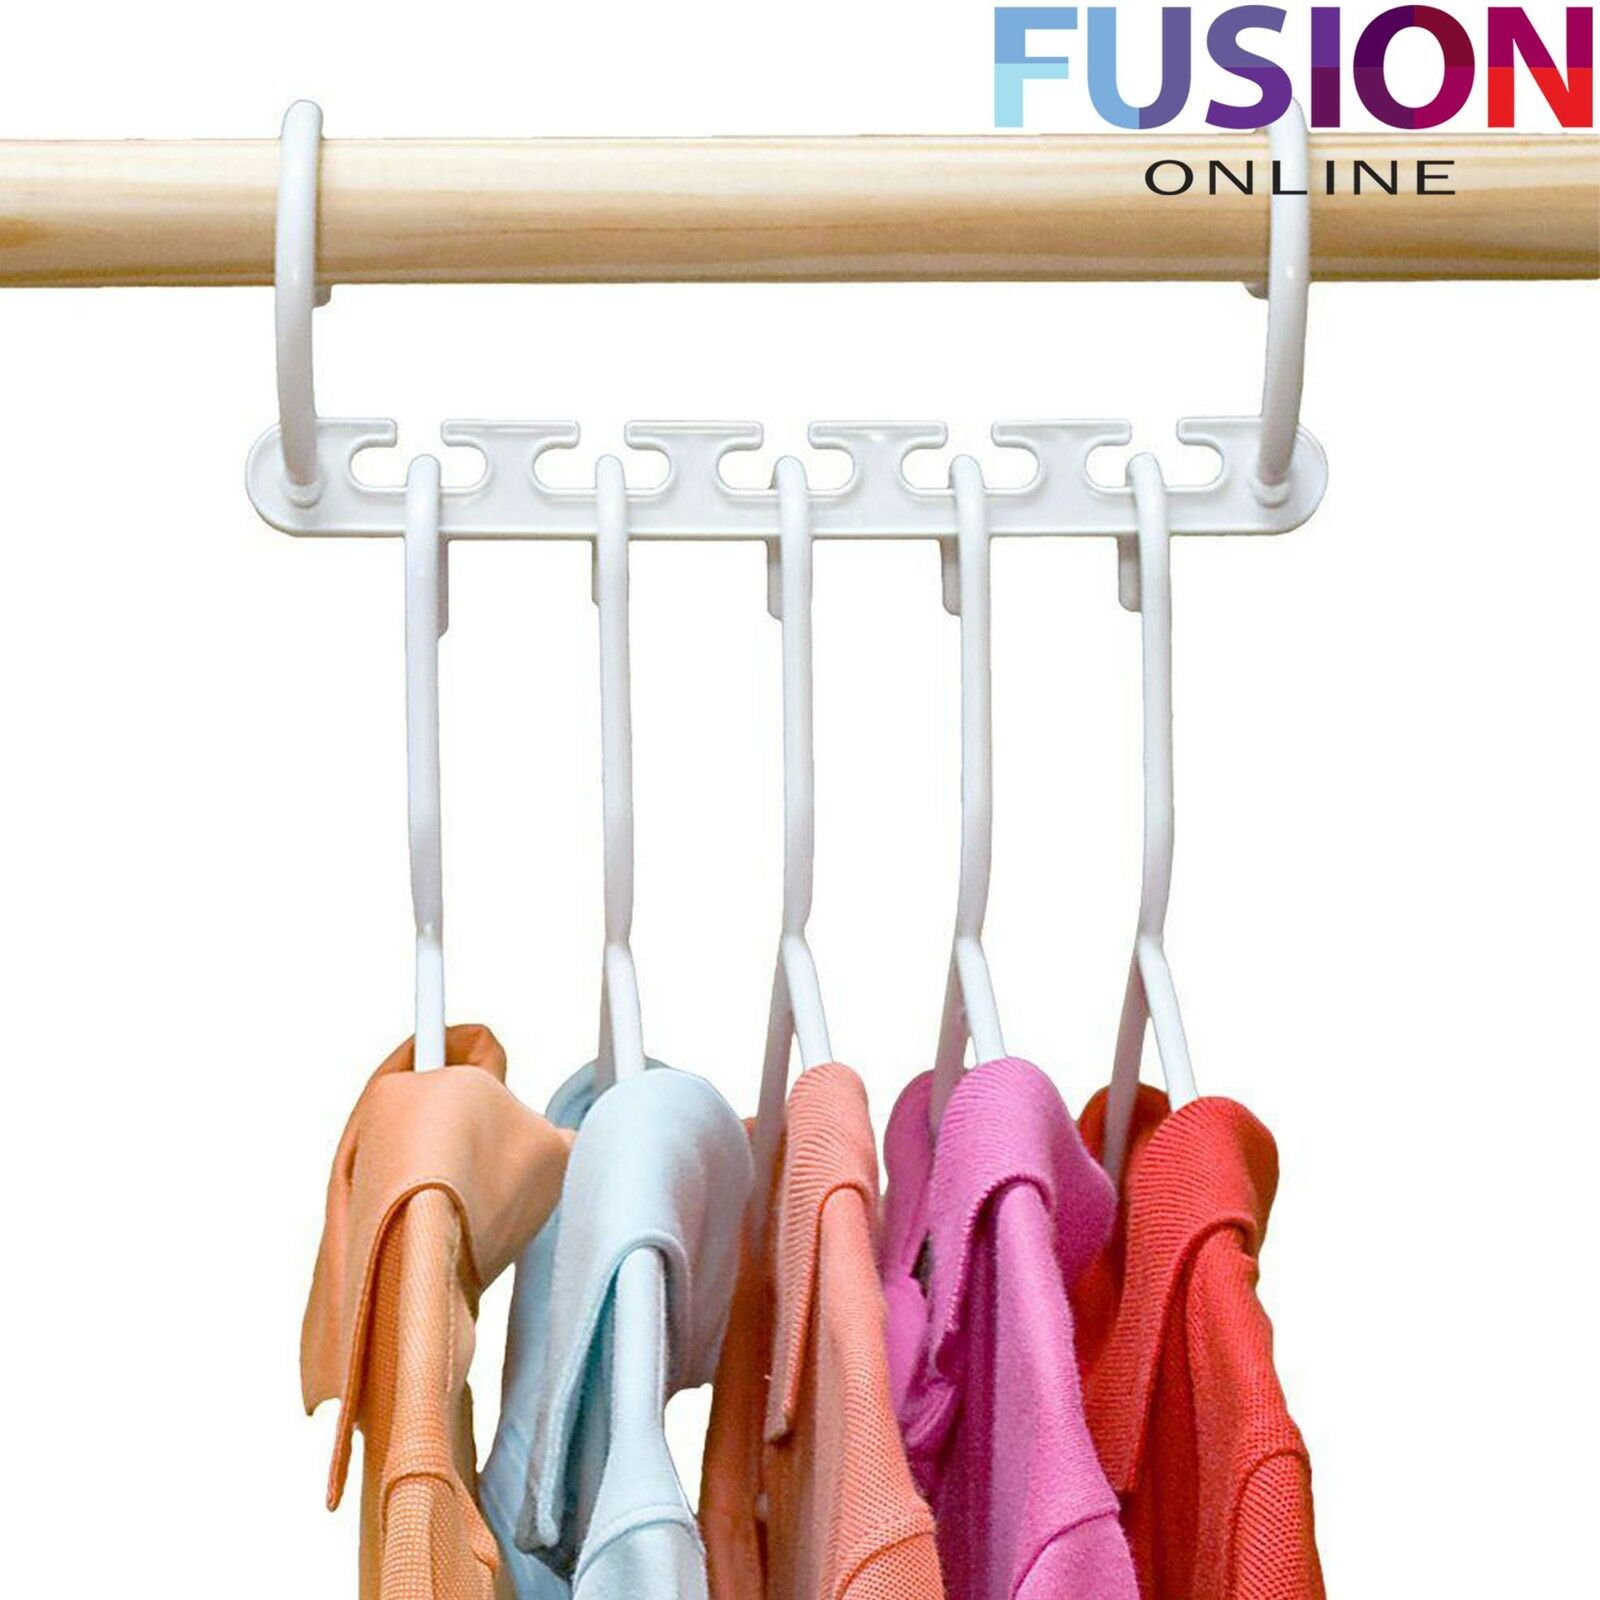 multi function clothes hangers space saving closet organizer magic wonder rack ebay. Black Bedroom Furniture Sets. Home Design Ideas